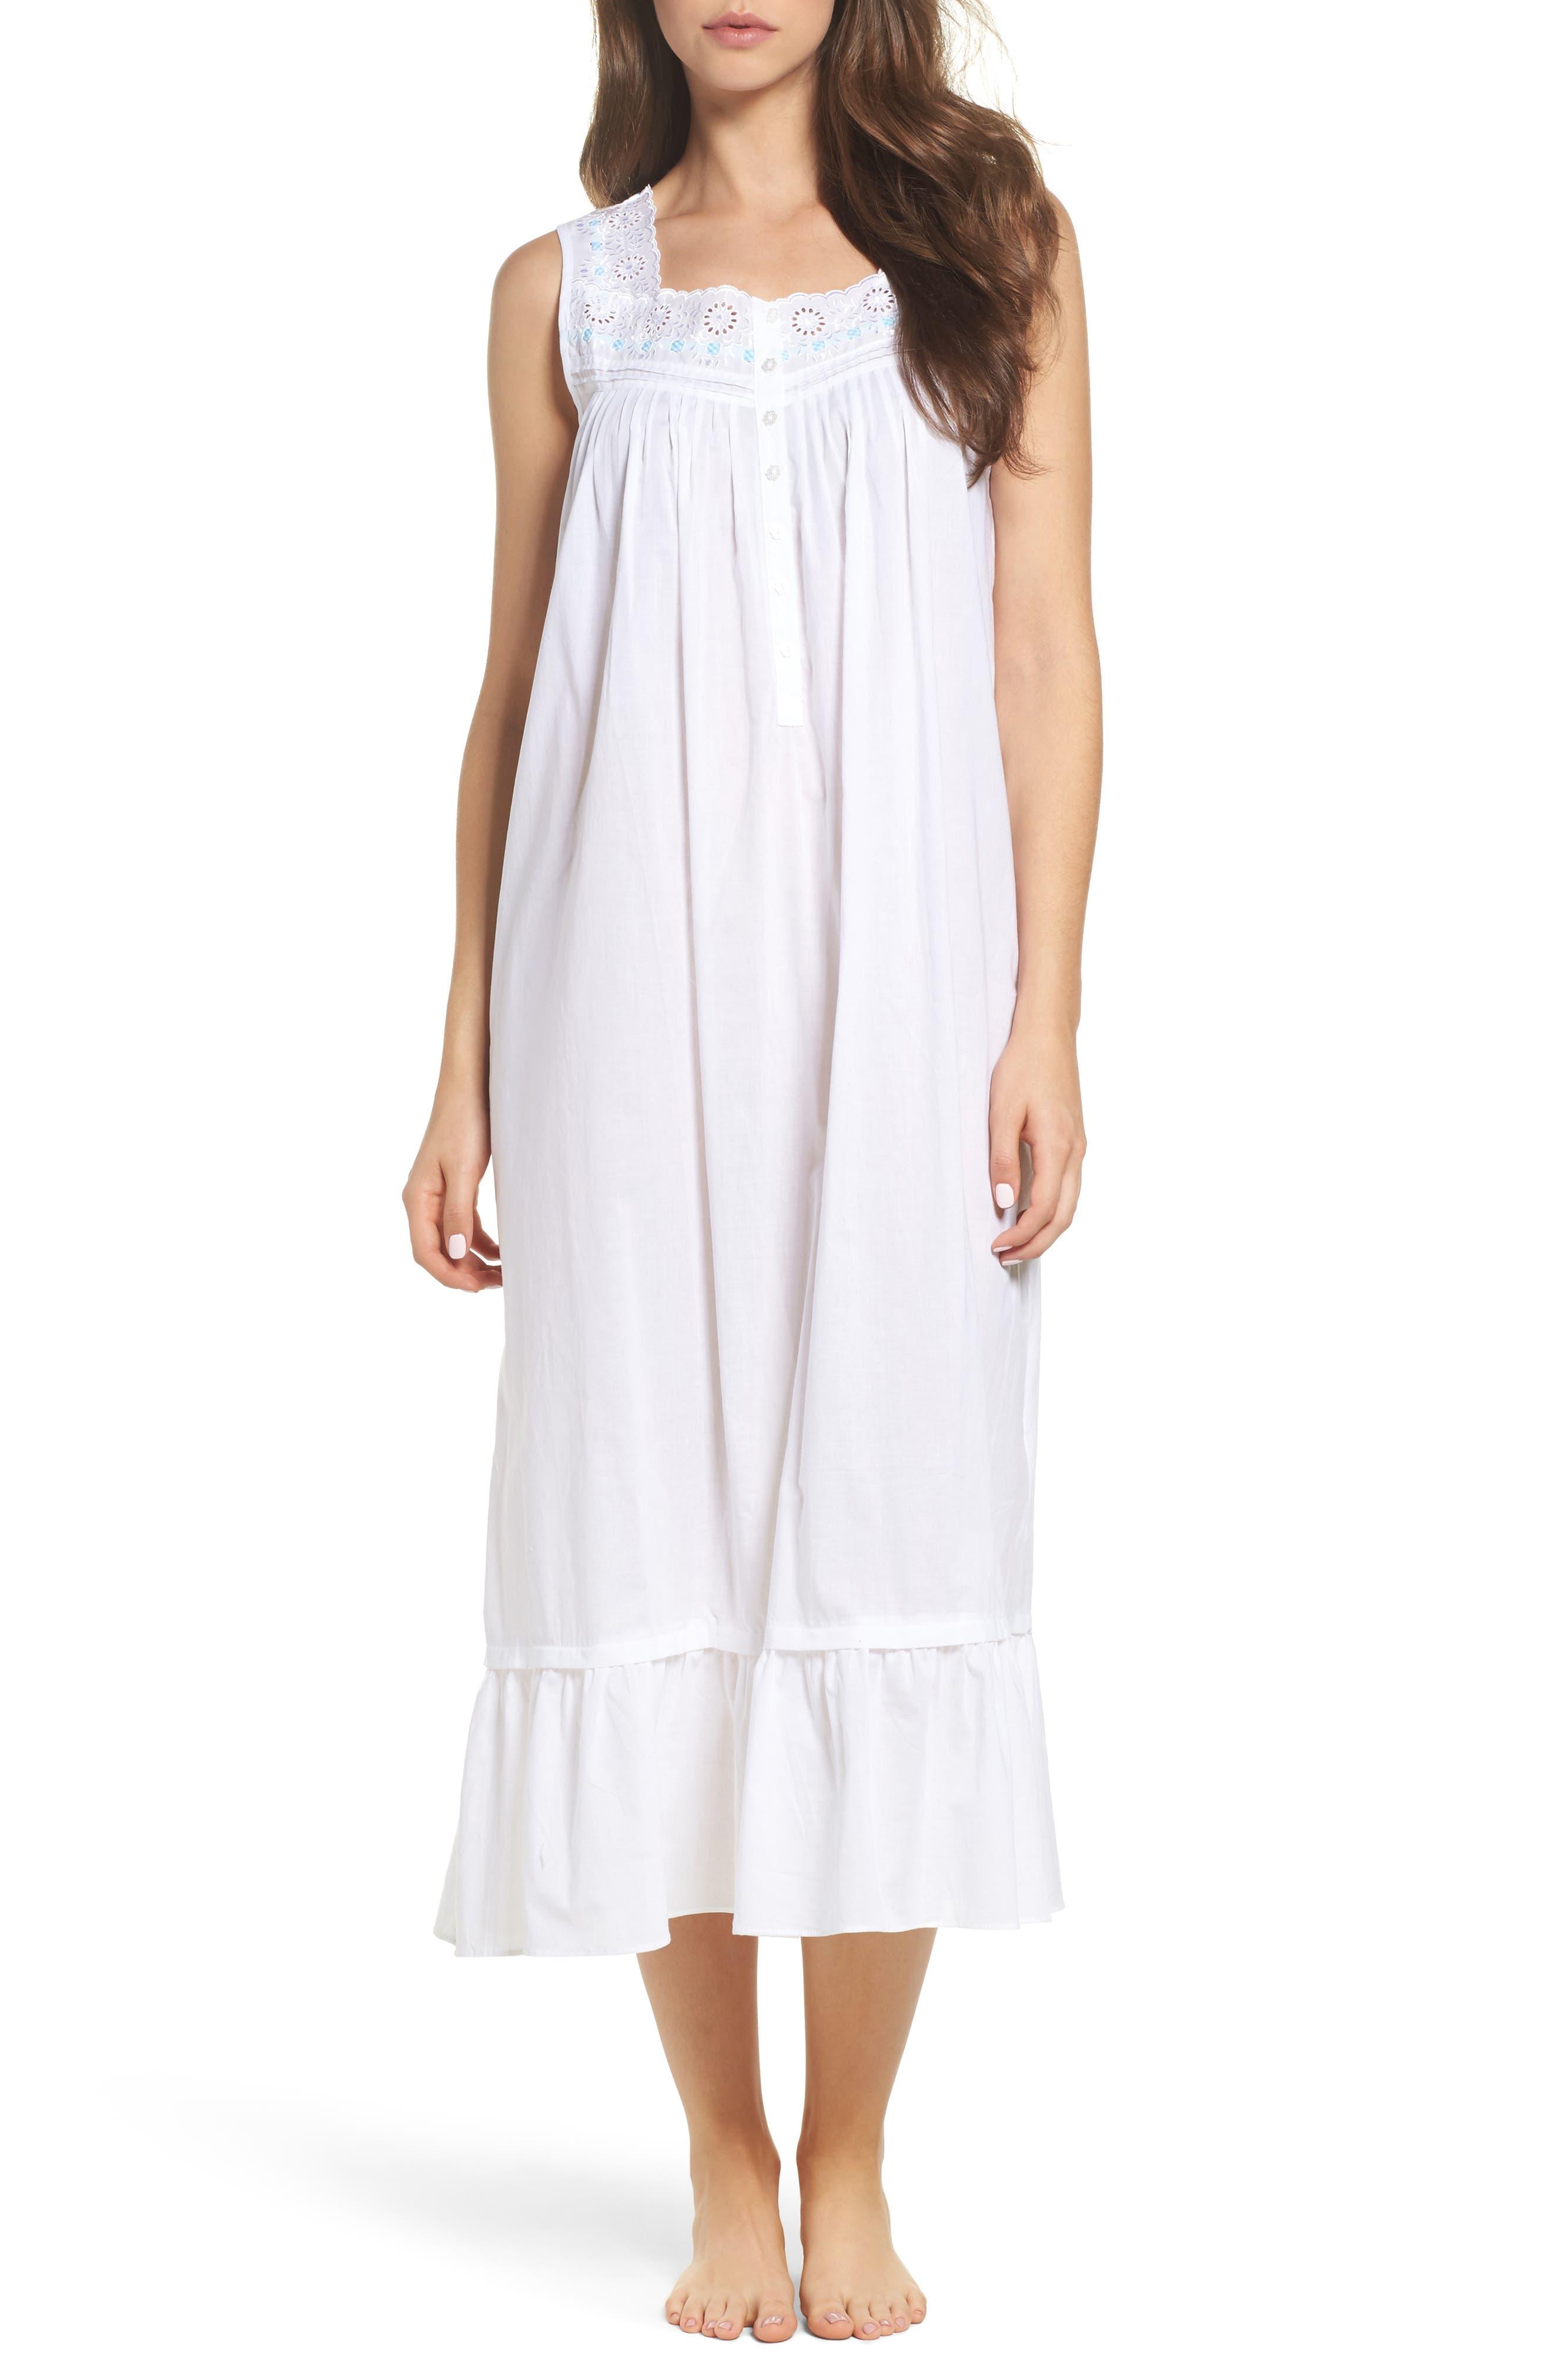 Ballet Nightgown,                             Main thumbnail 1, color,                             White